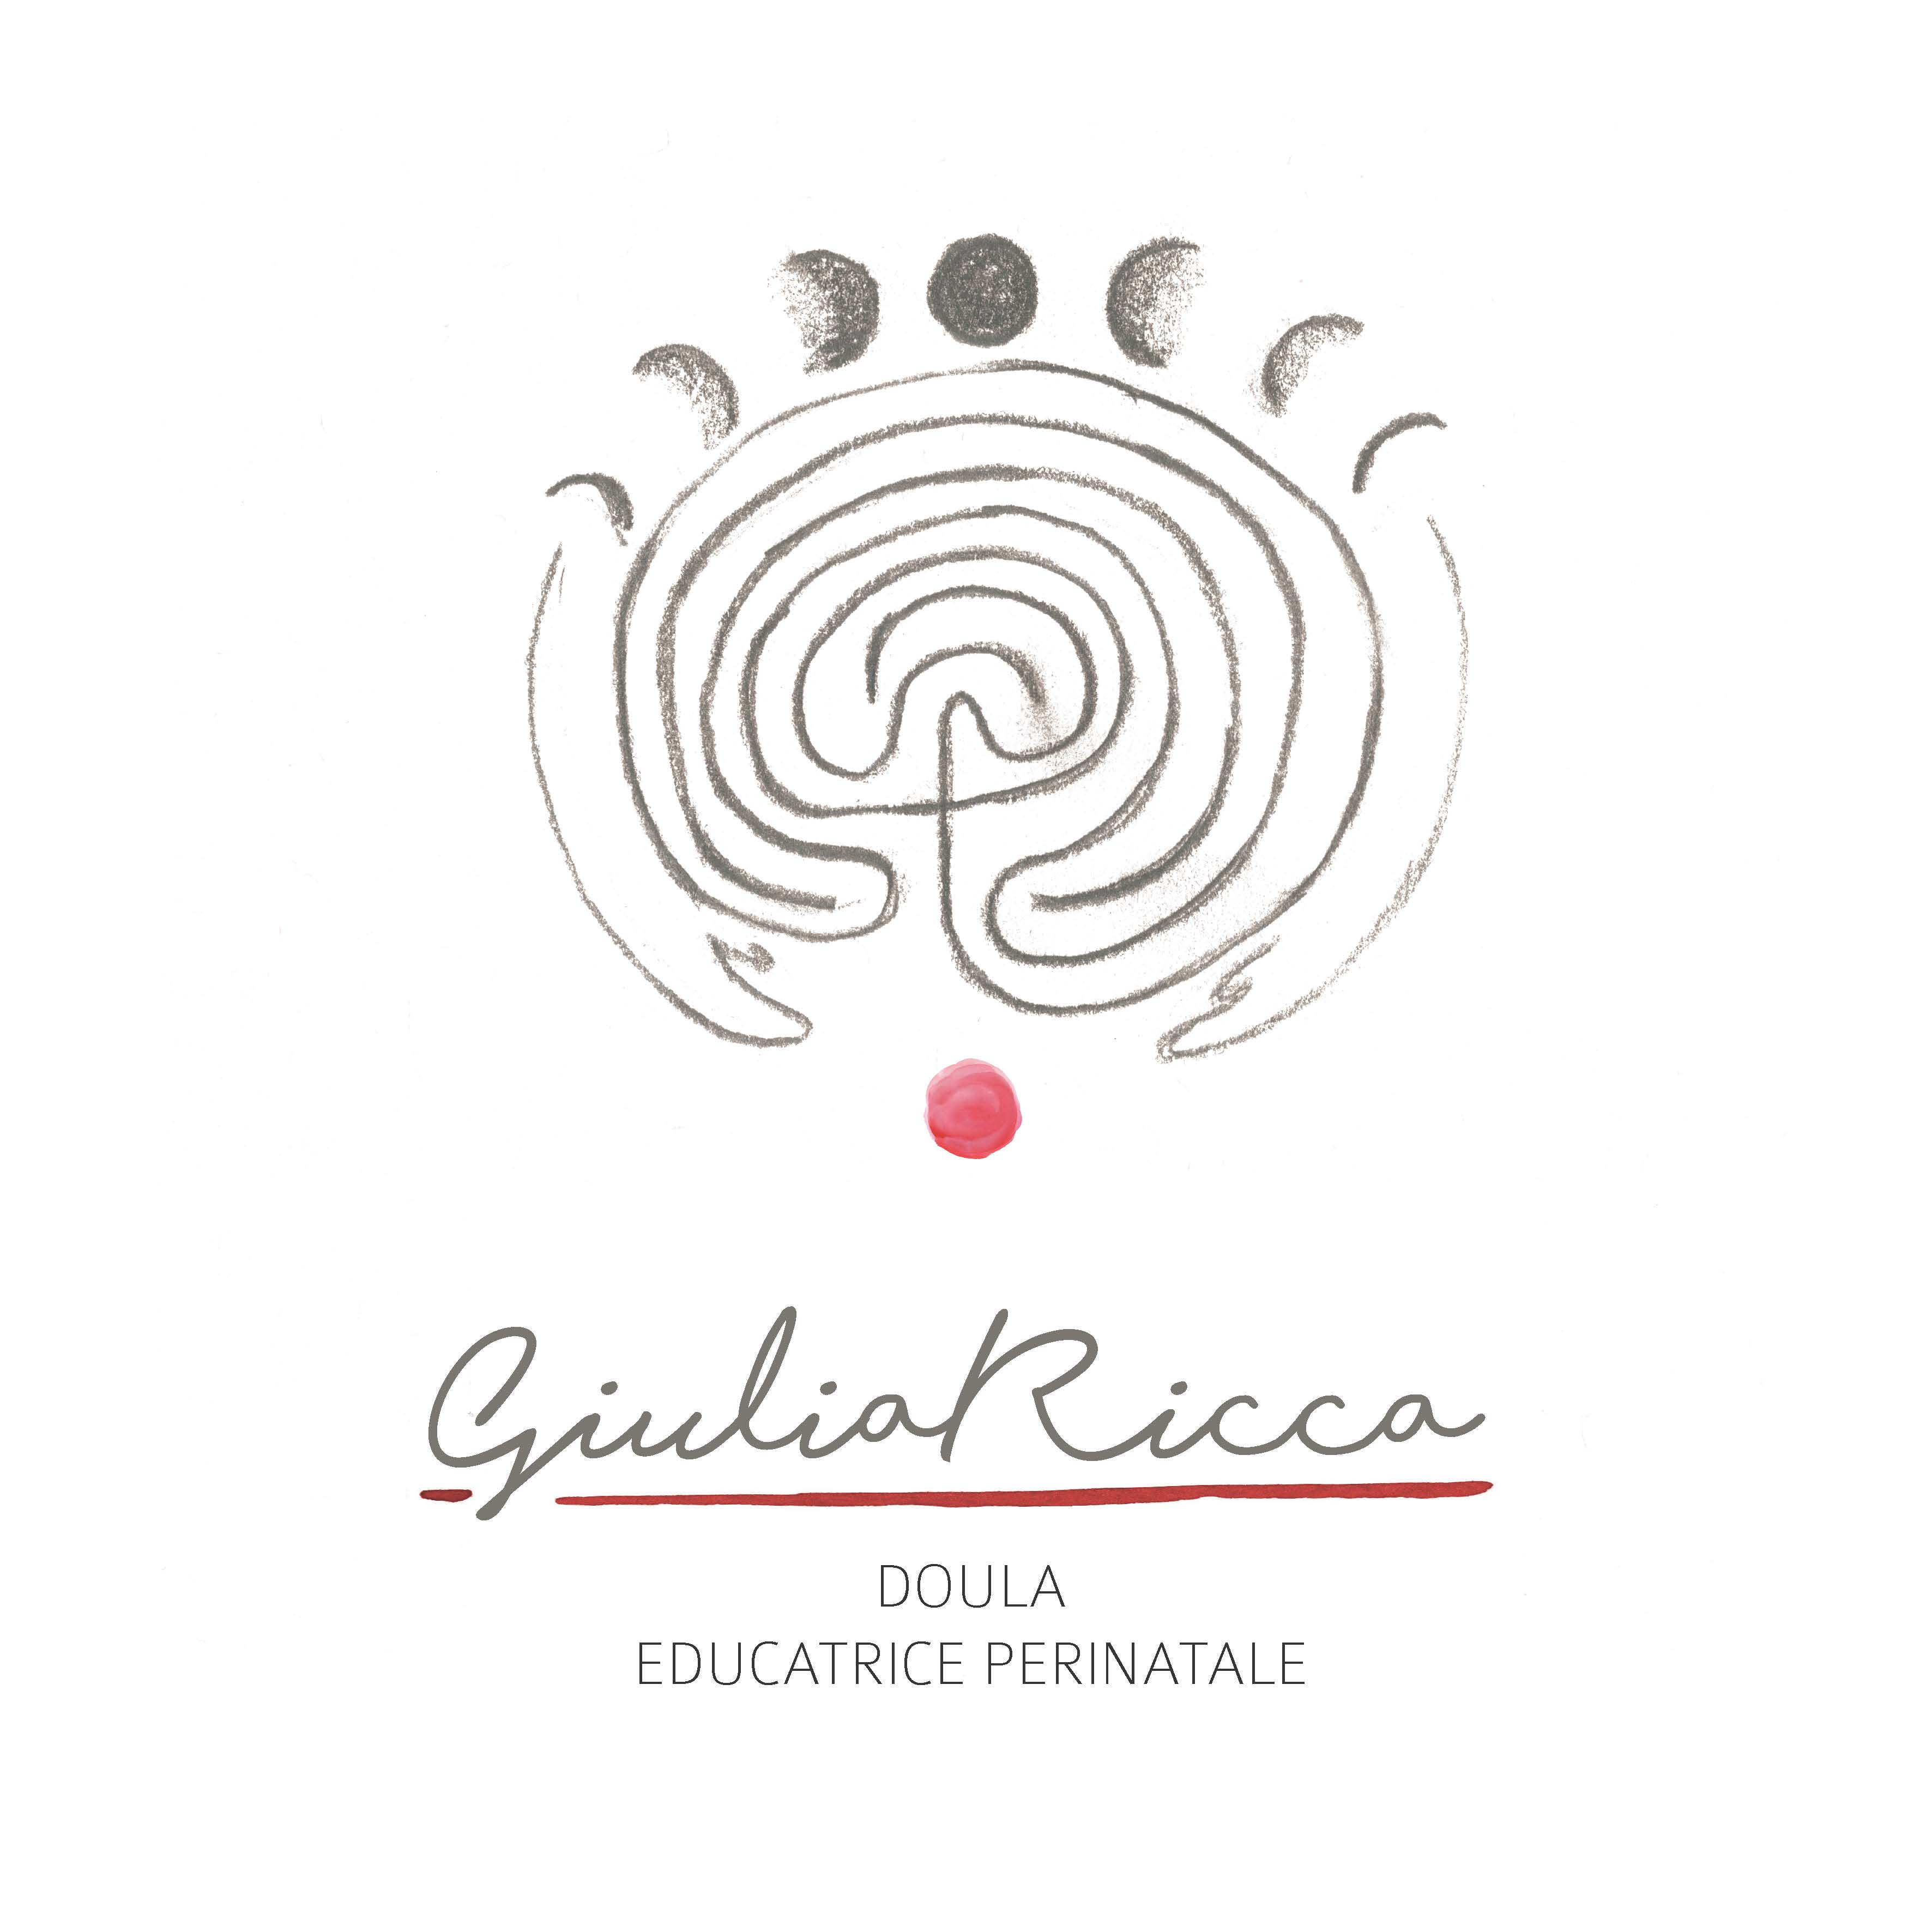 giulia ricca logo